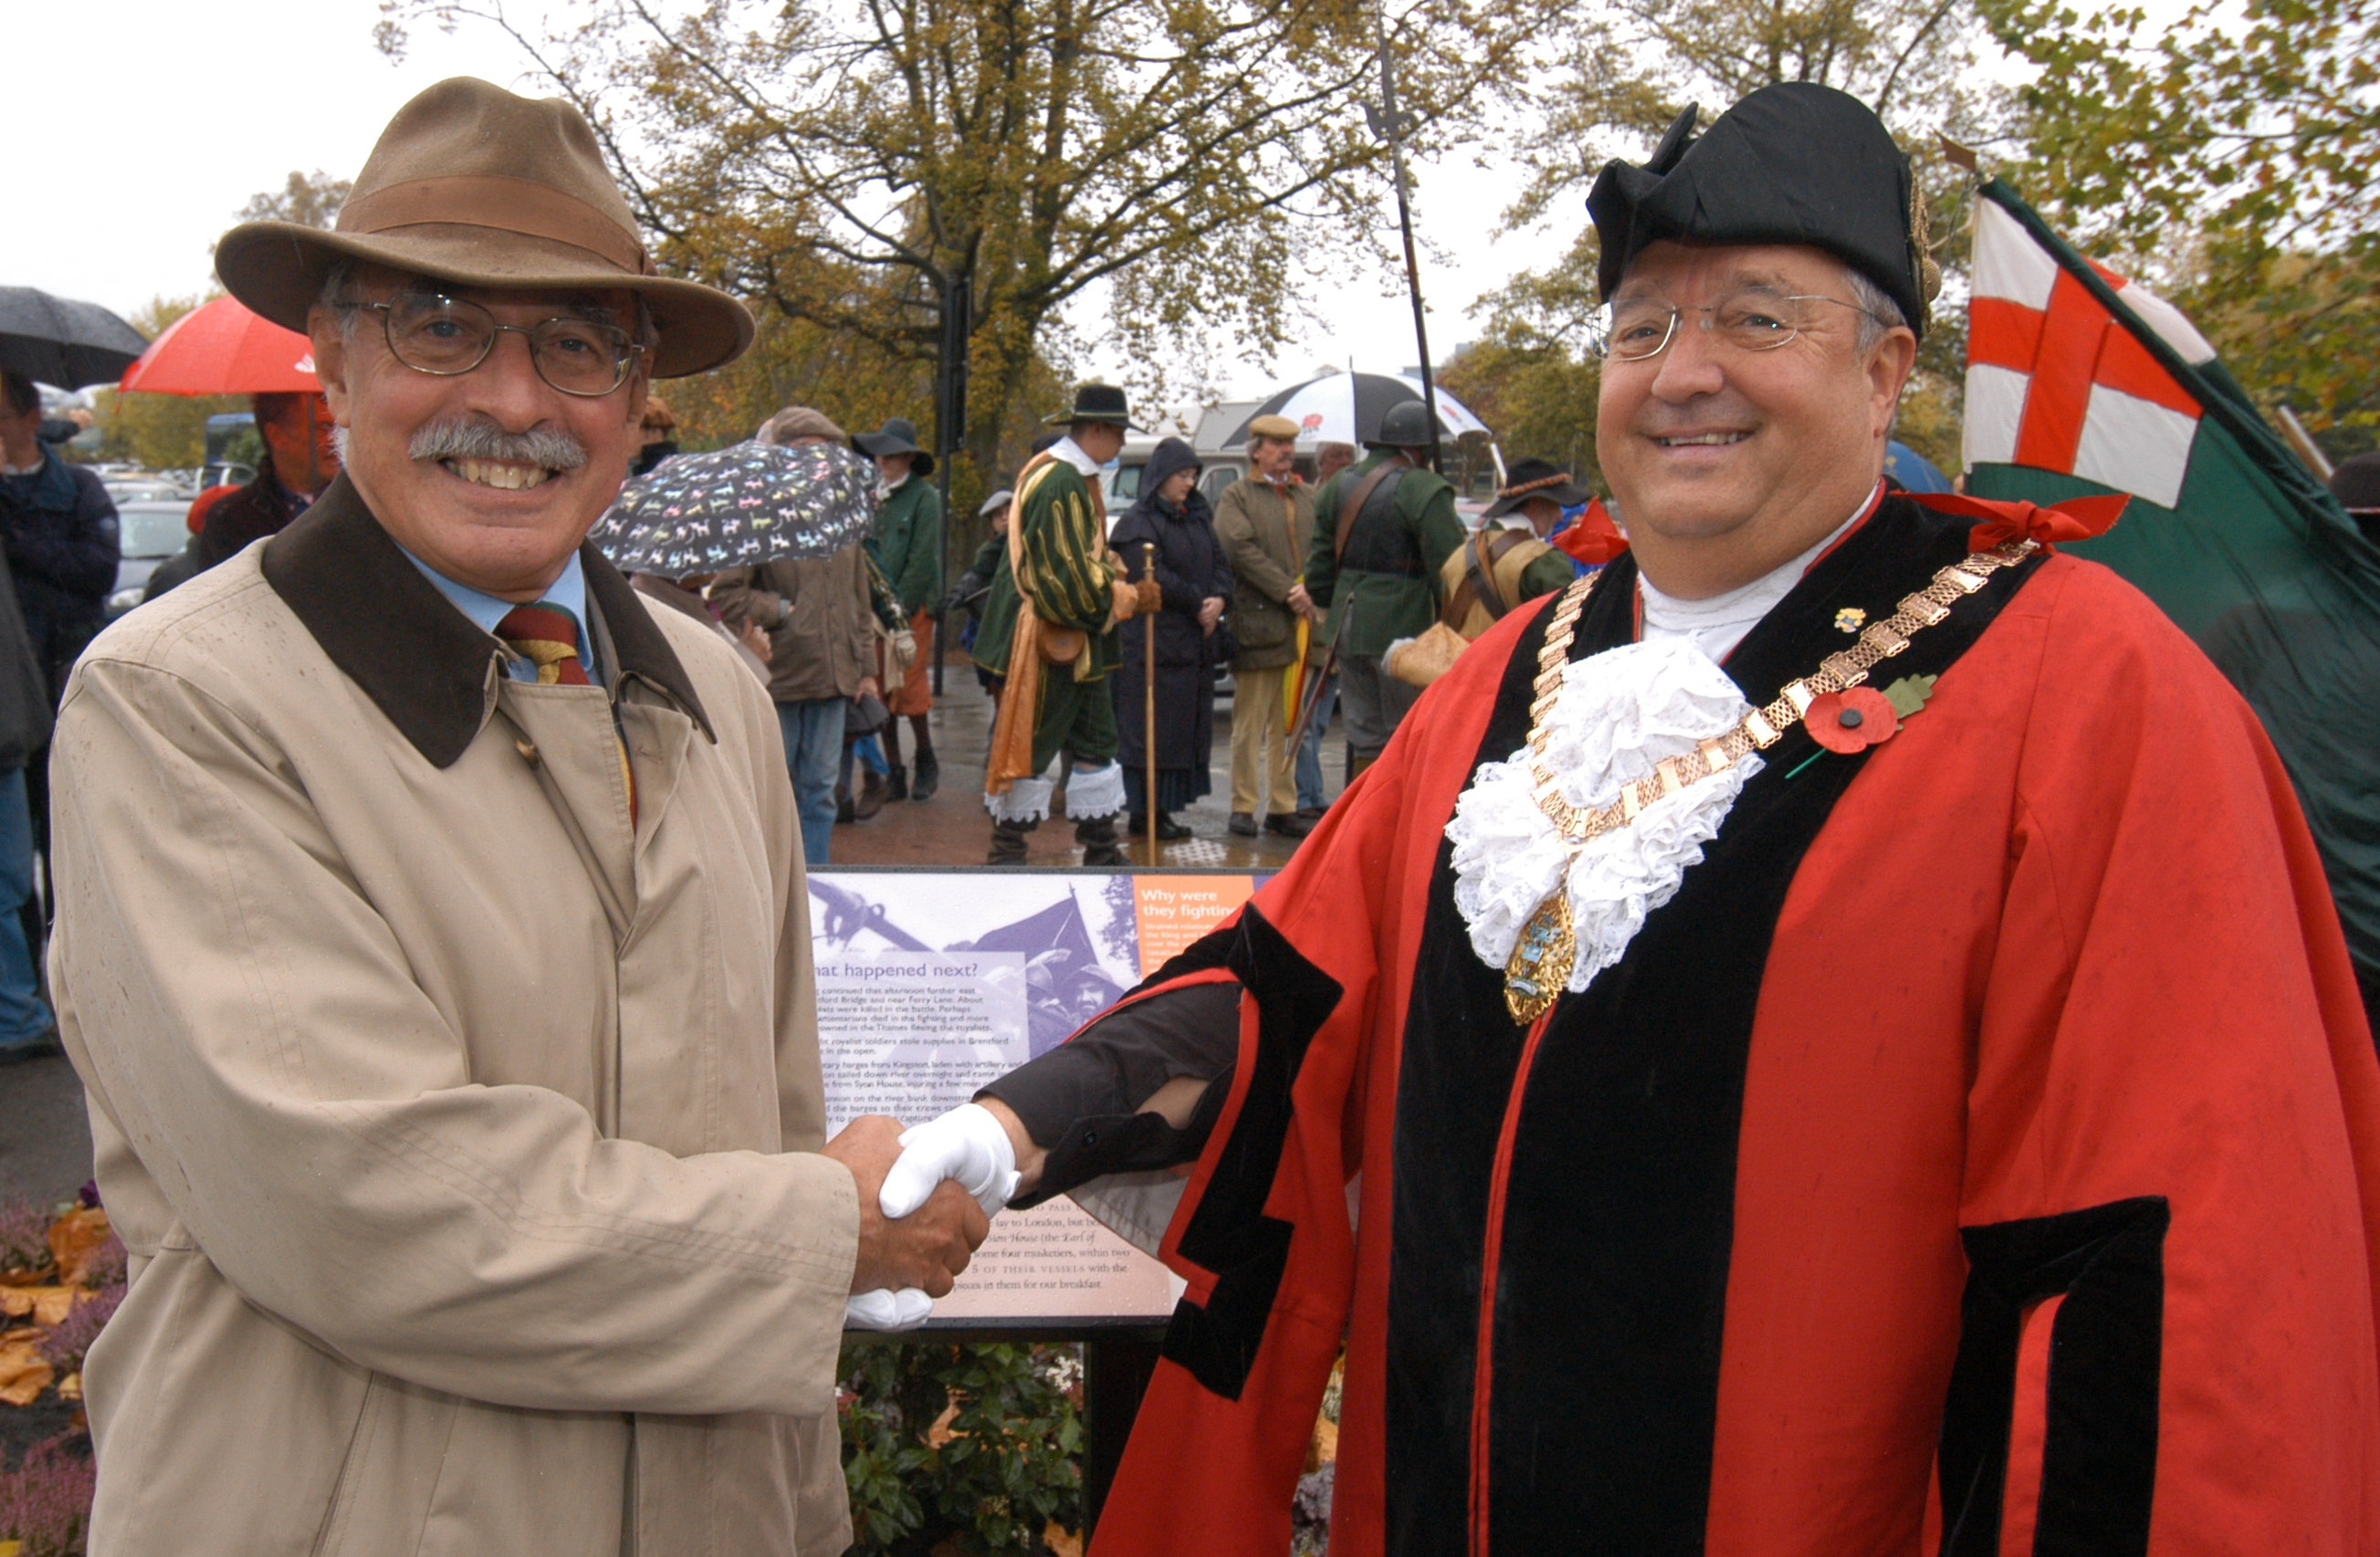 richard-holmes-with-mayor-of-hounslow